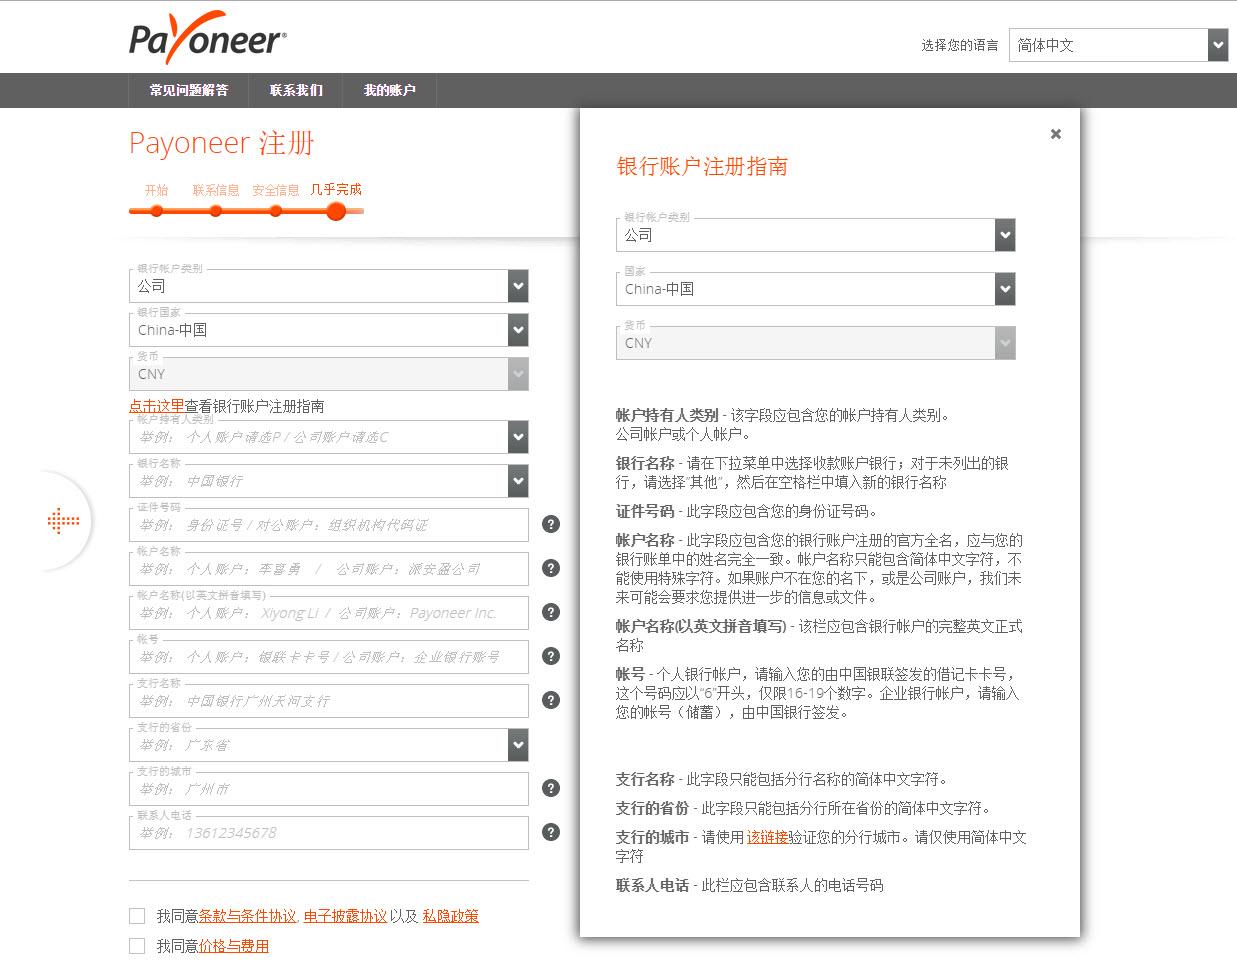 Payoneer注册流程(公司账户)图四